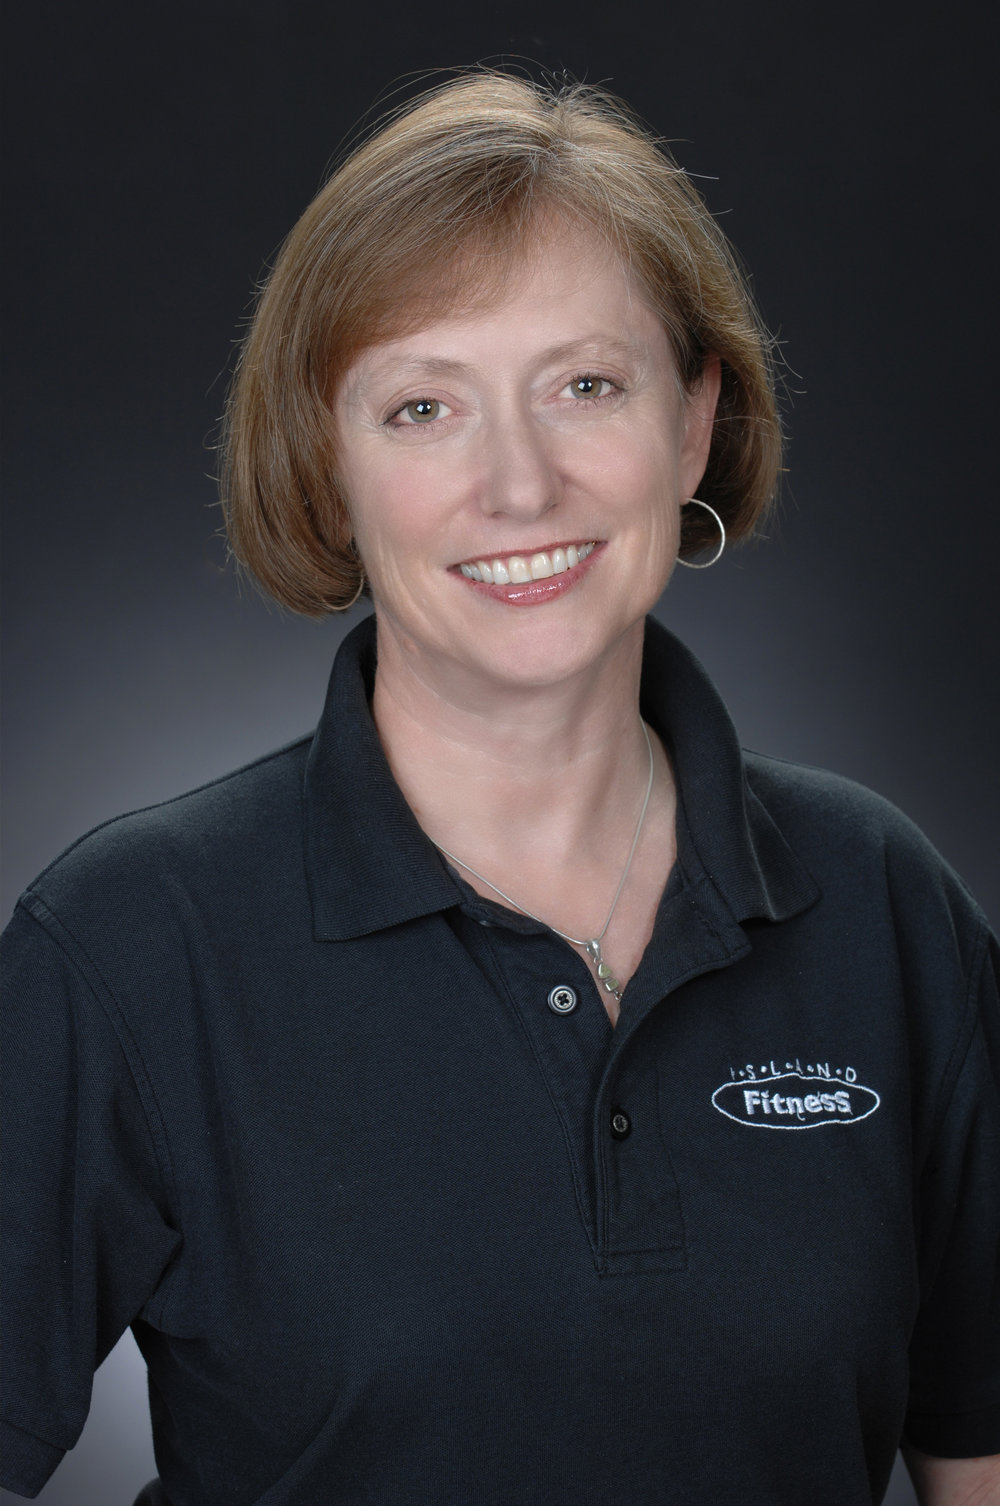 ANN NEW | Professional Trainer